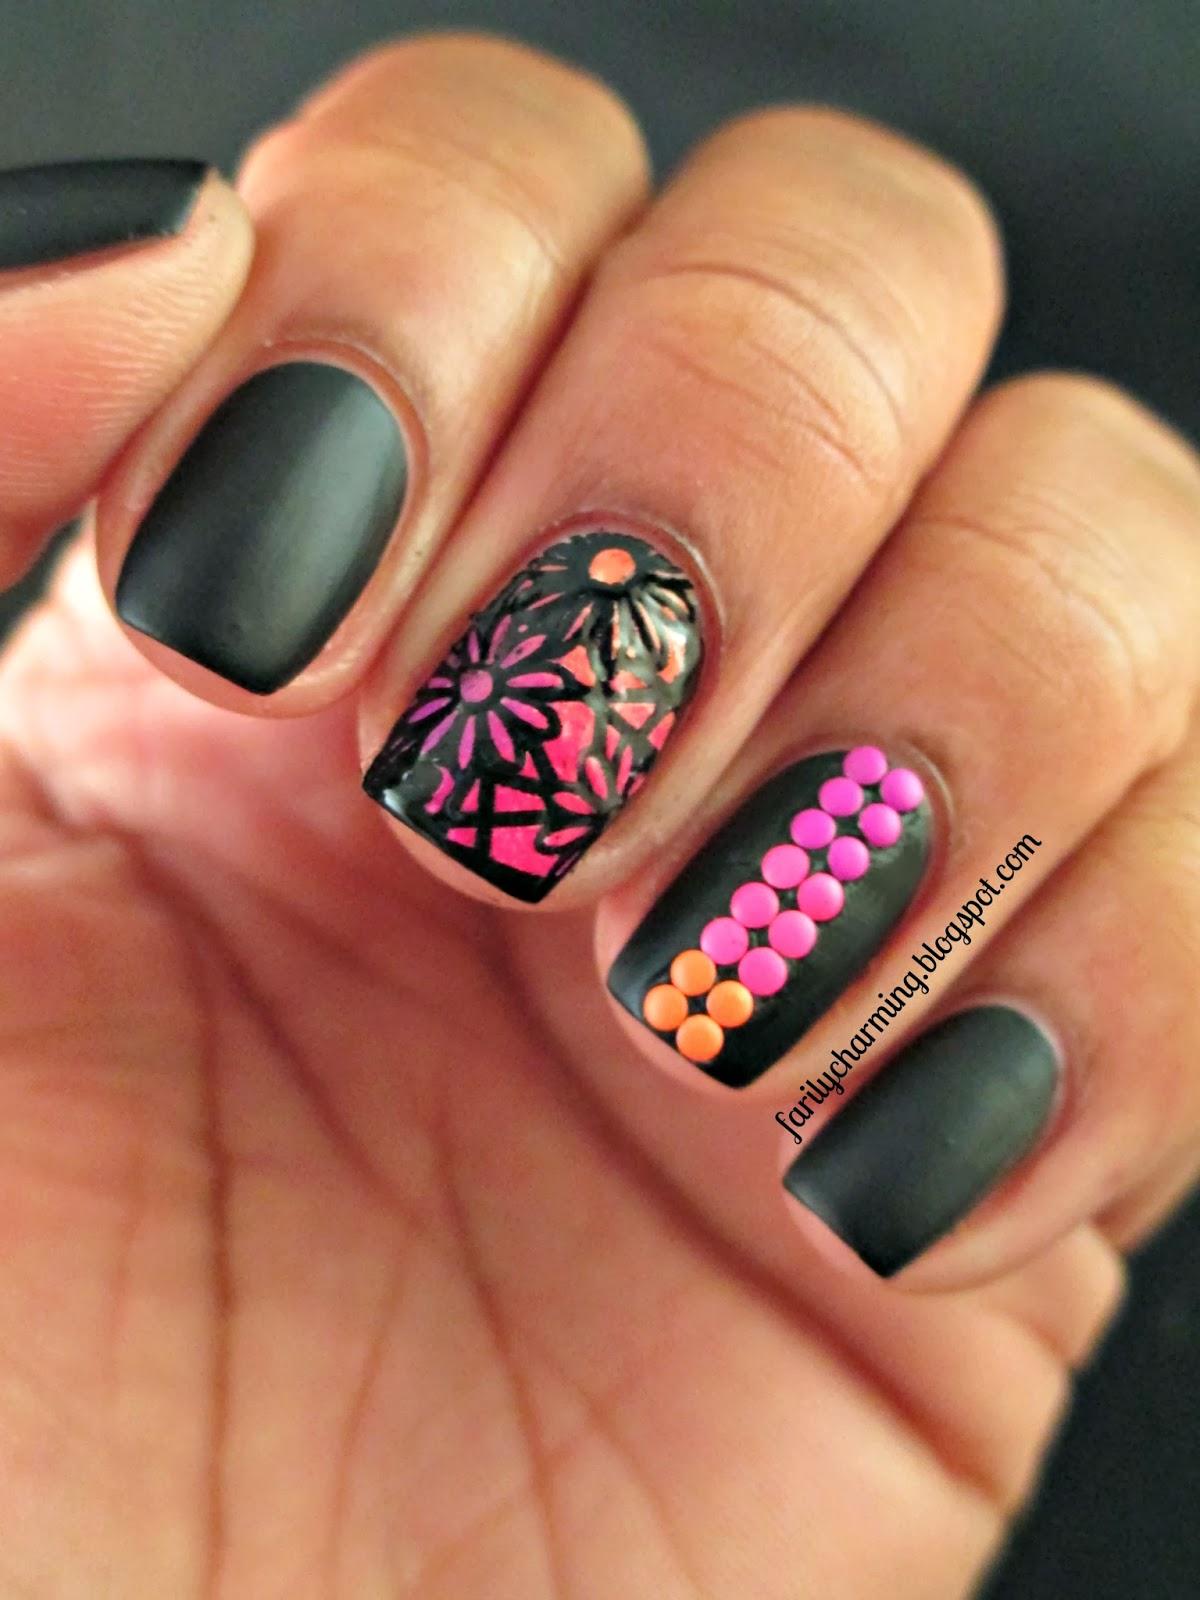 Nail art society august 2014